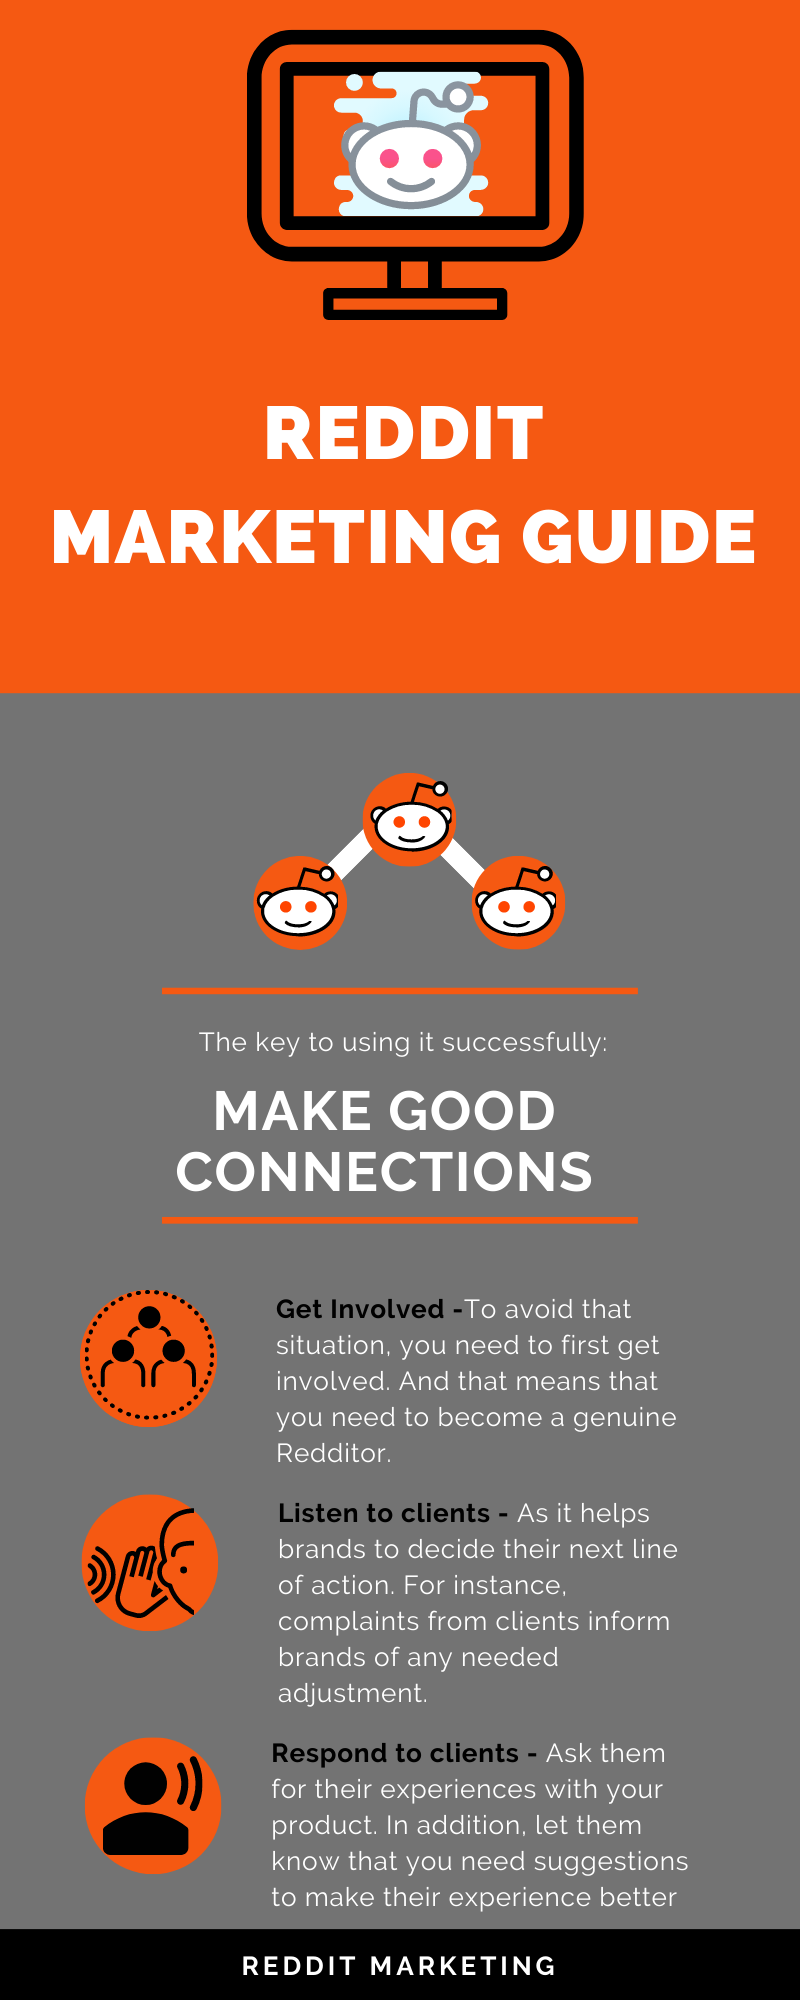 Reddit Marketing Guide